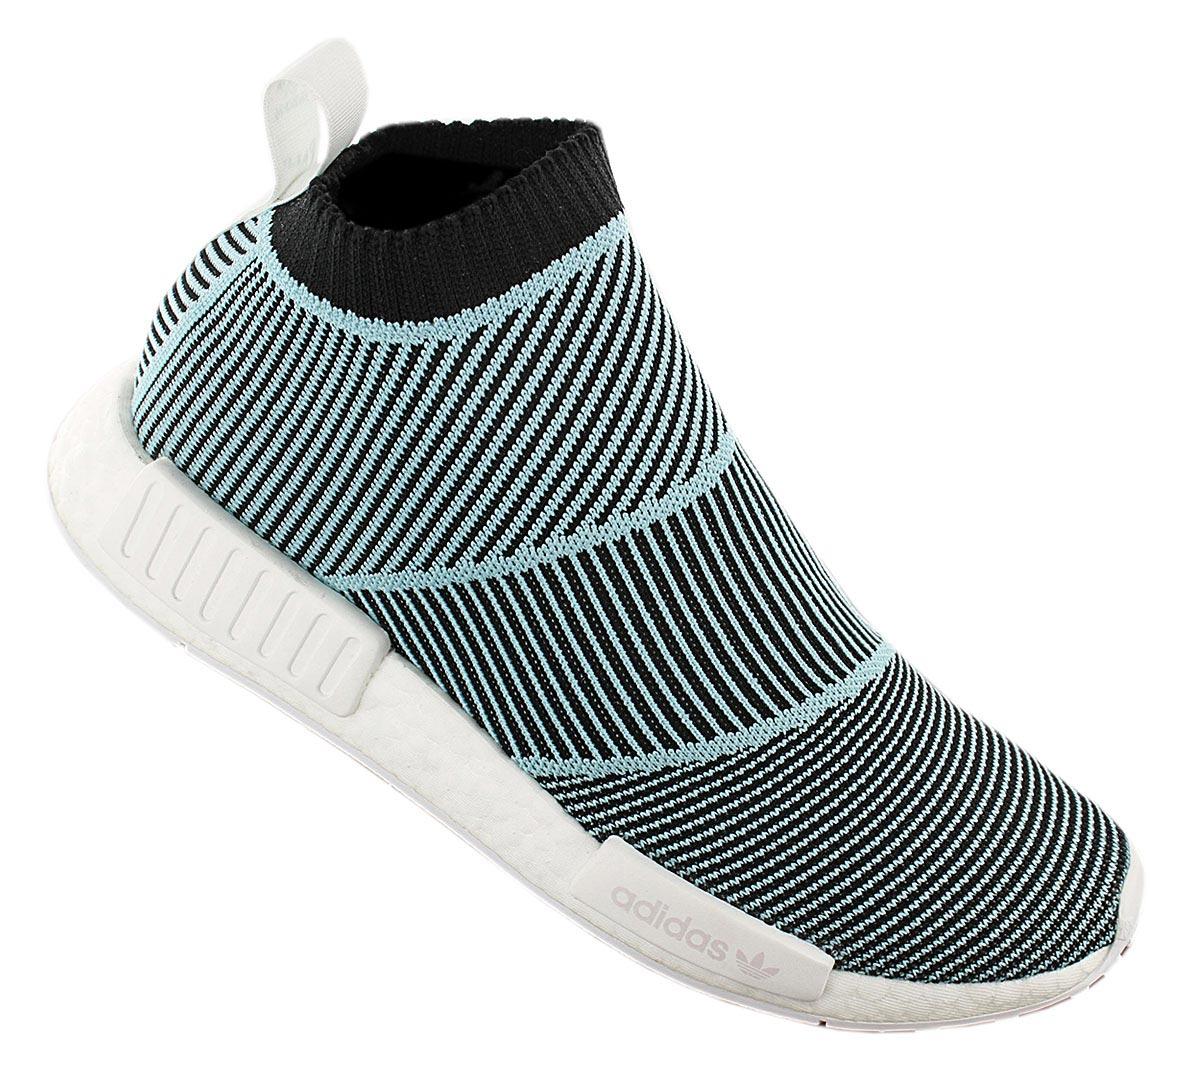 Détails sur Adidas Nmd CS1 Parley Pk Primeknit Hommes Sneaker AC8597 Chaussures Baskets Neuf